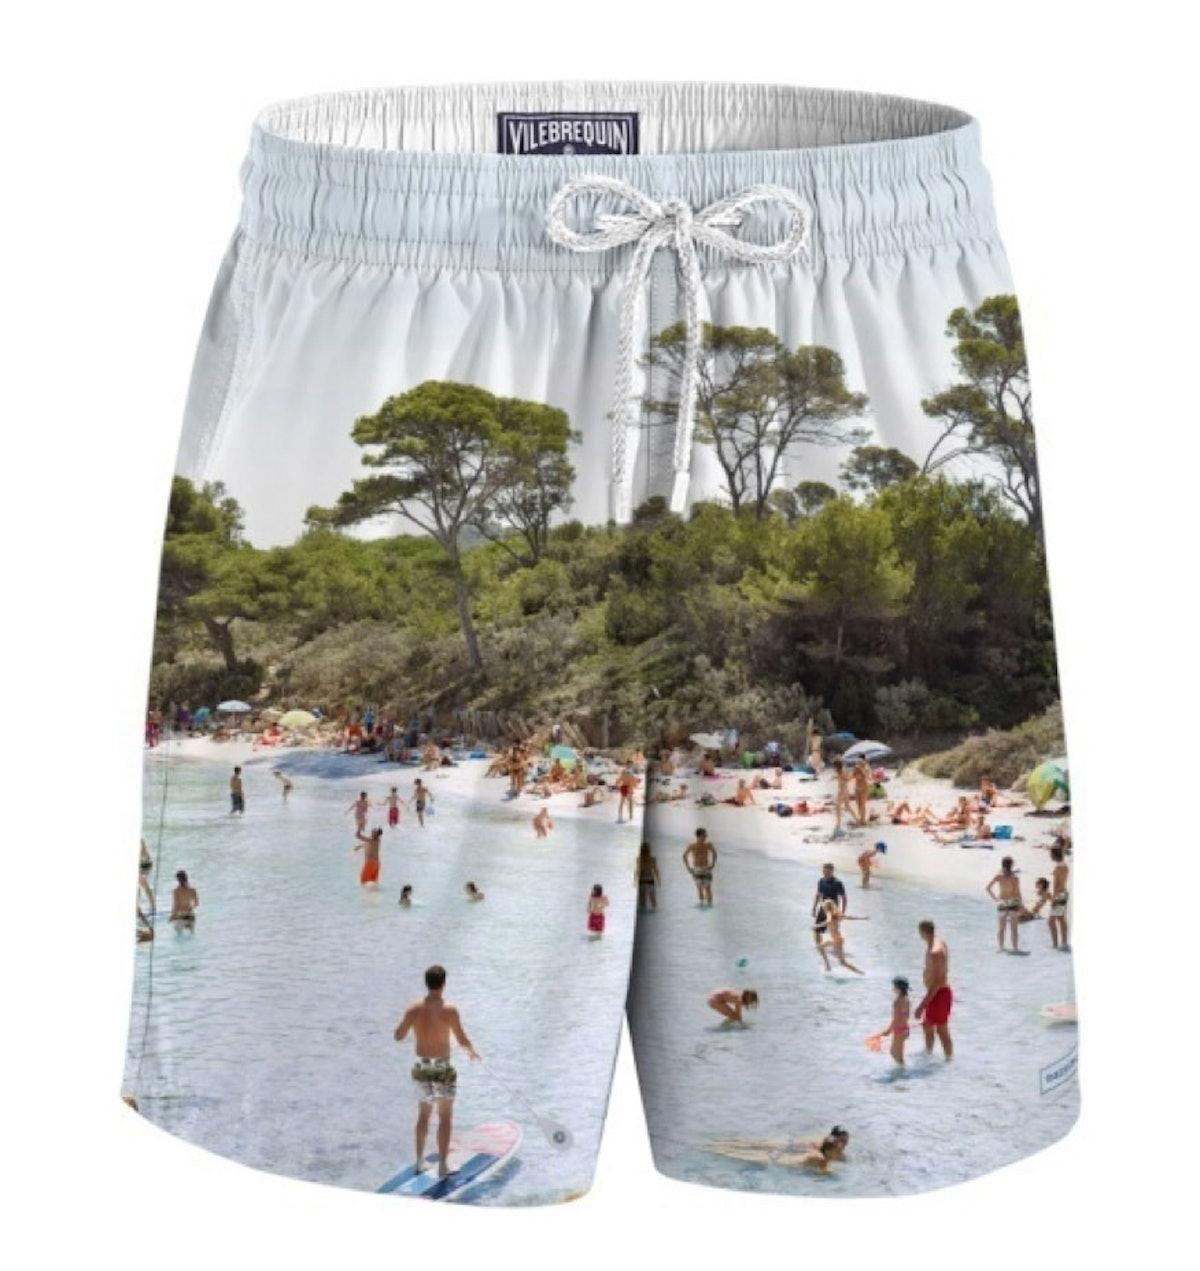 Massimo Vitali swim trunks